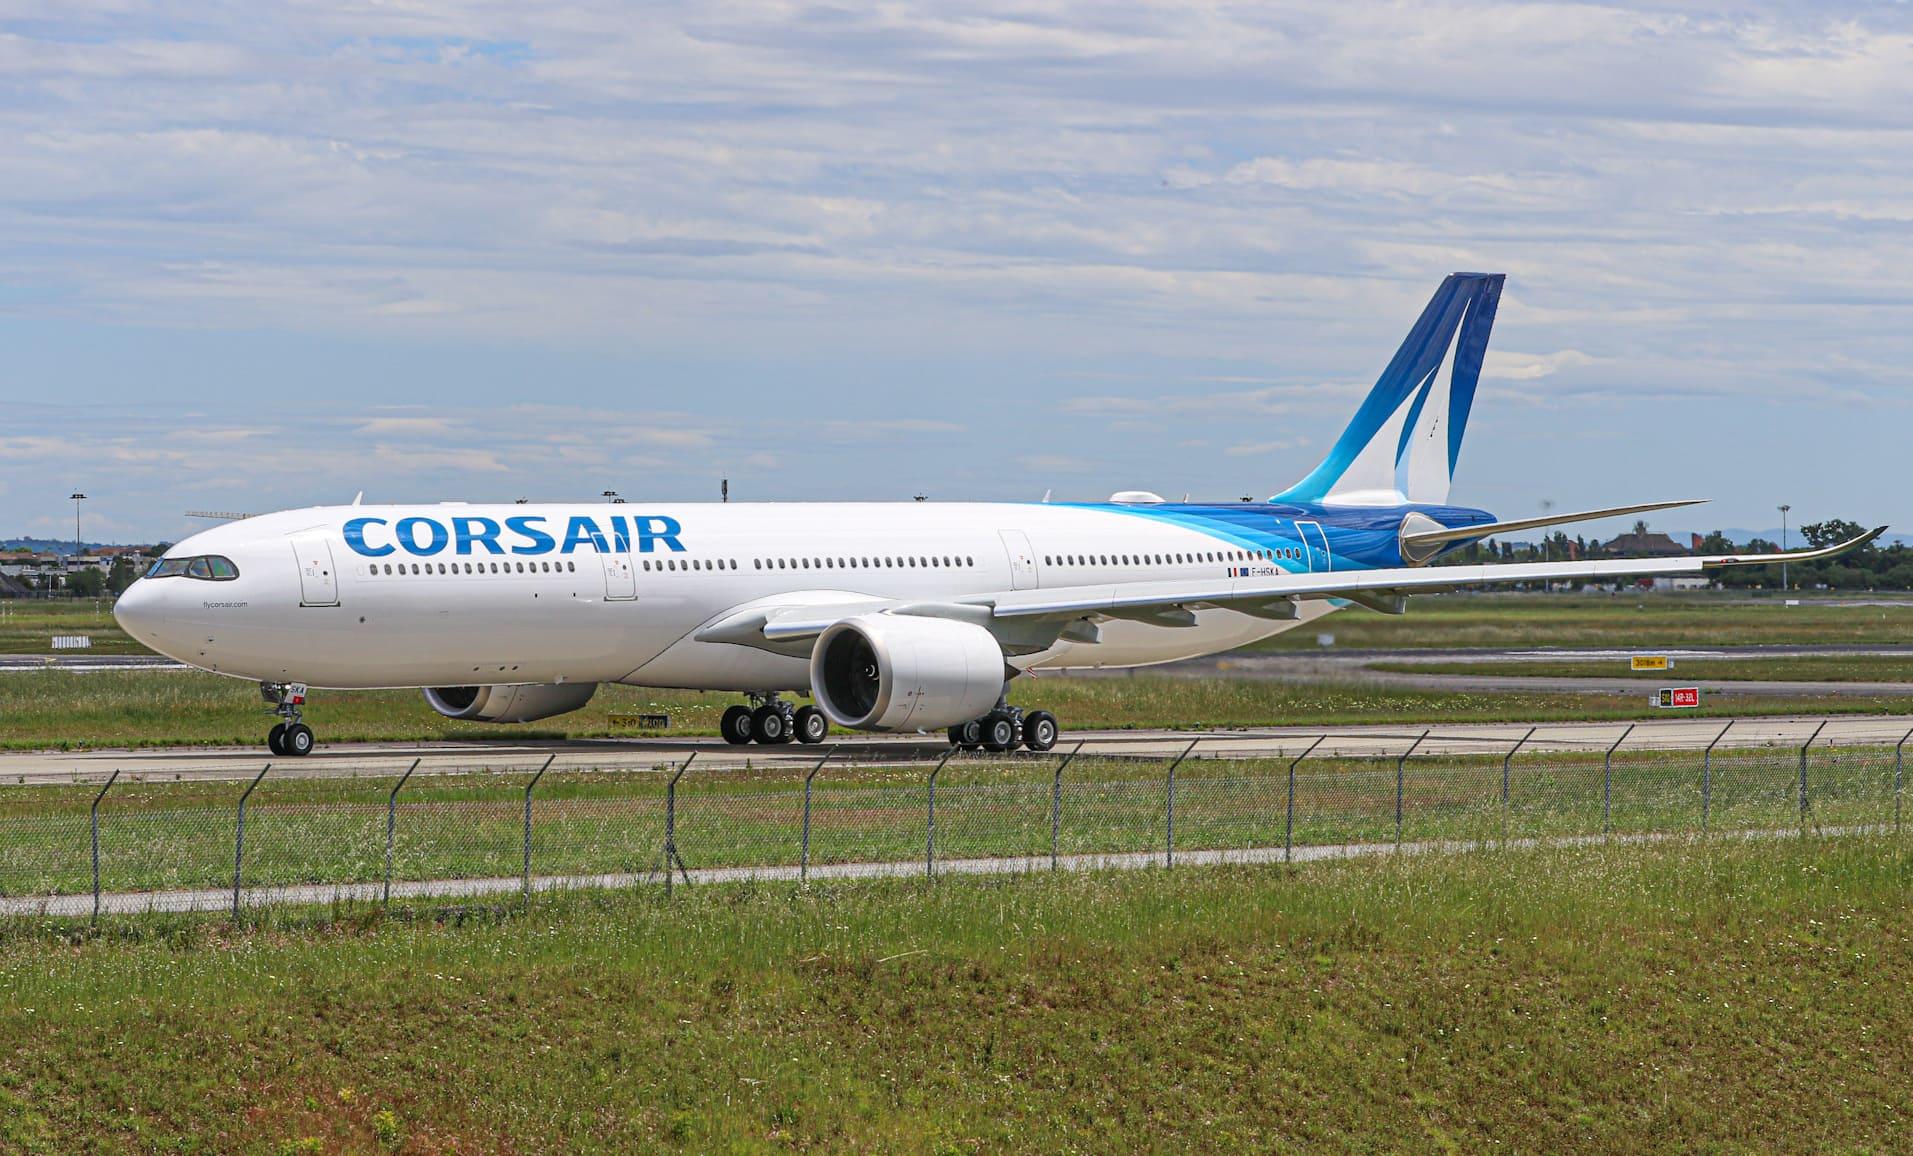 A330neo Corsair (F-HSKA) ce mercredi 12 mai à TLS